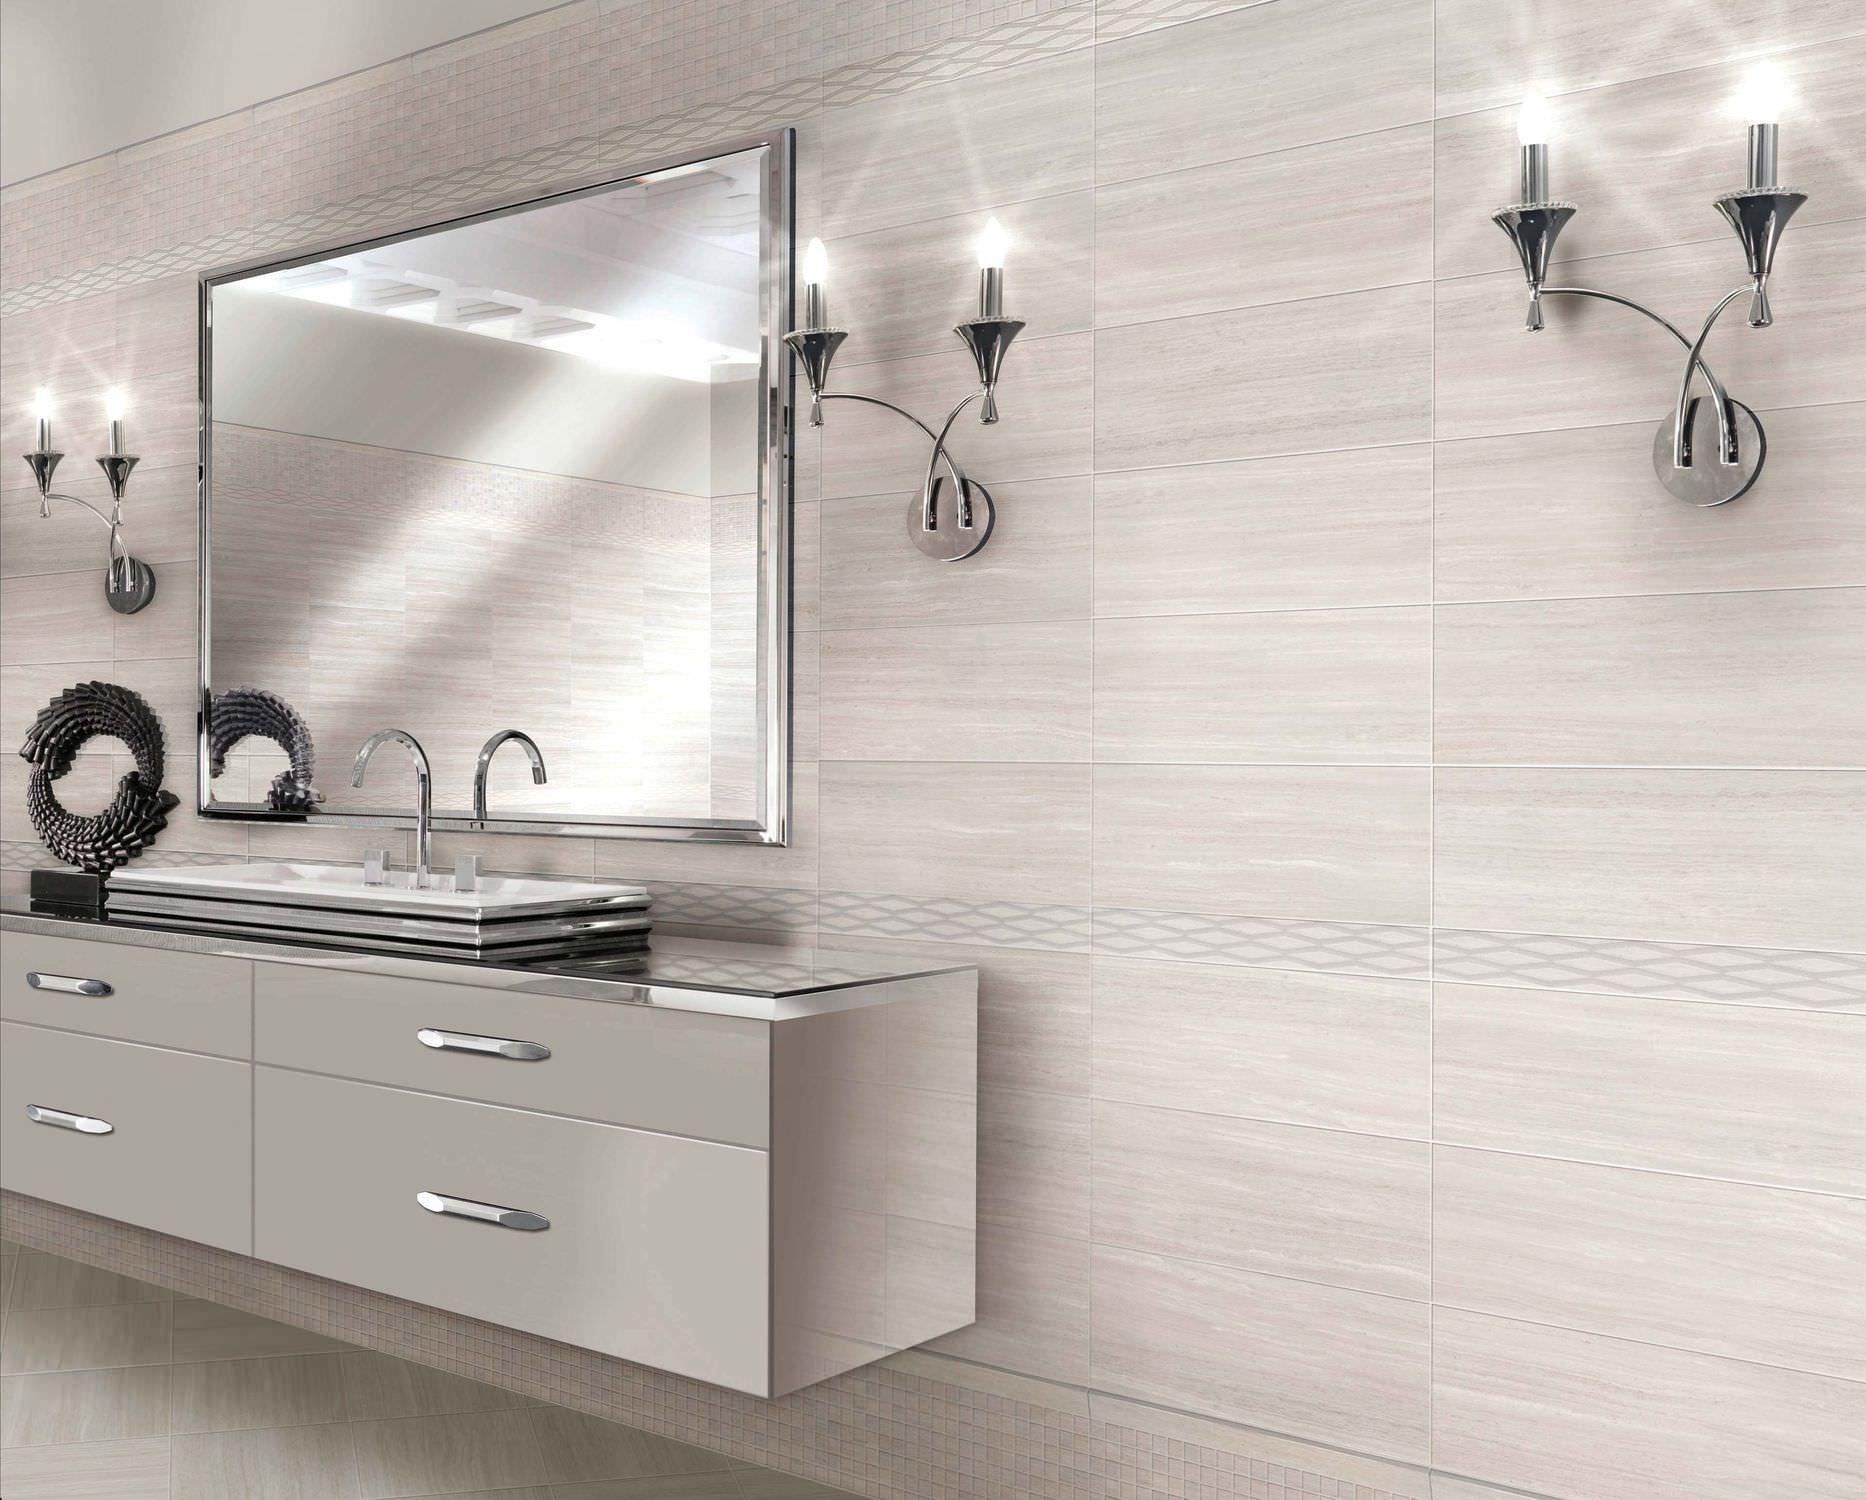 Bathroom tile floor for floors porcelain stoneware bathroom tile floor for floors porcelain stoneware dailygadgetfo Gallery